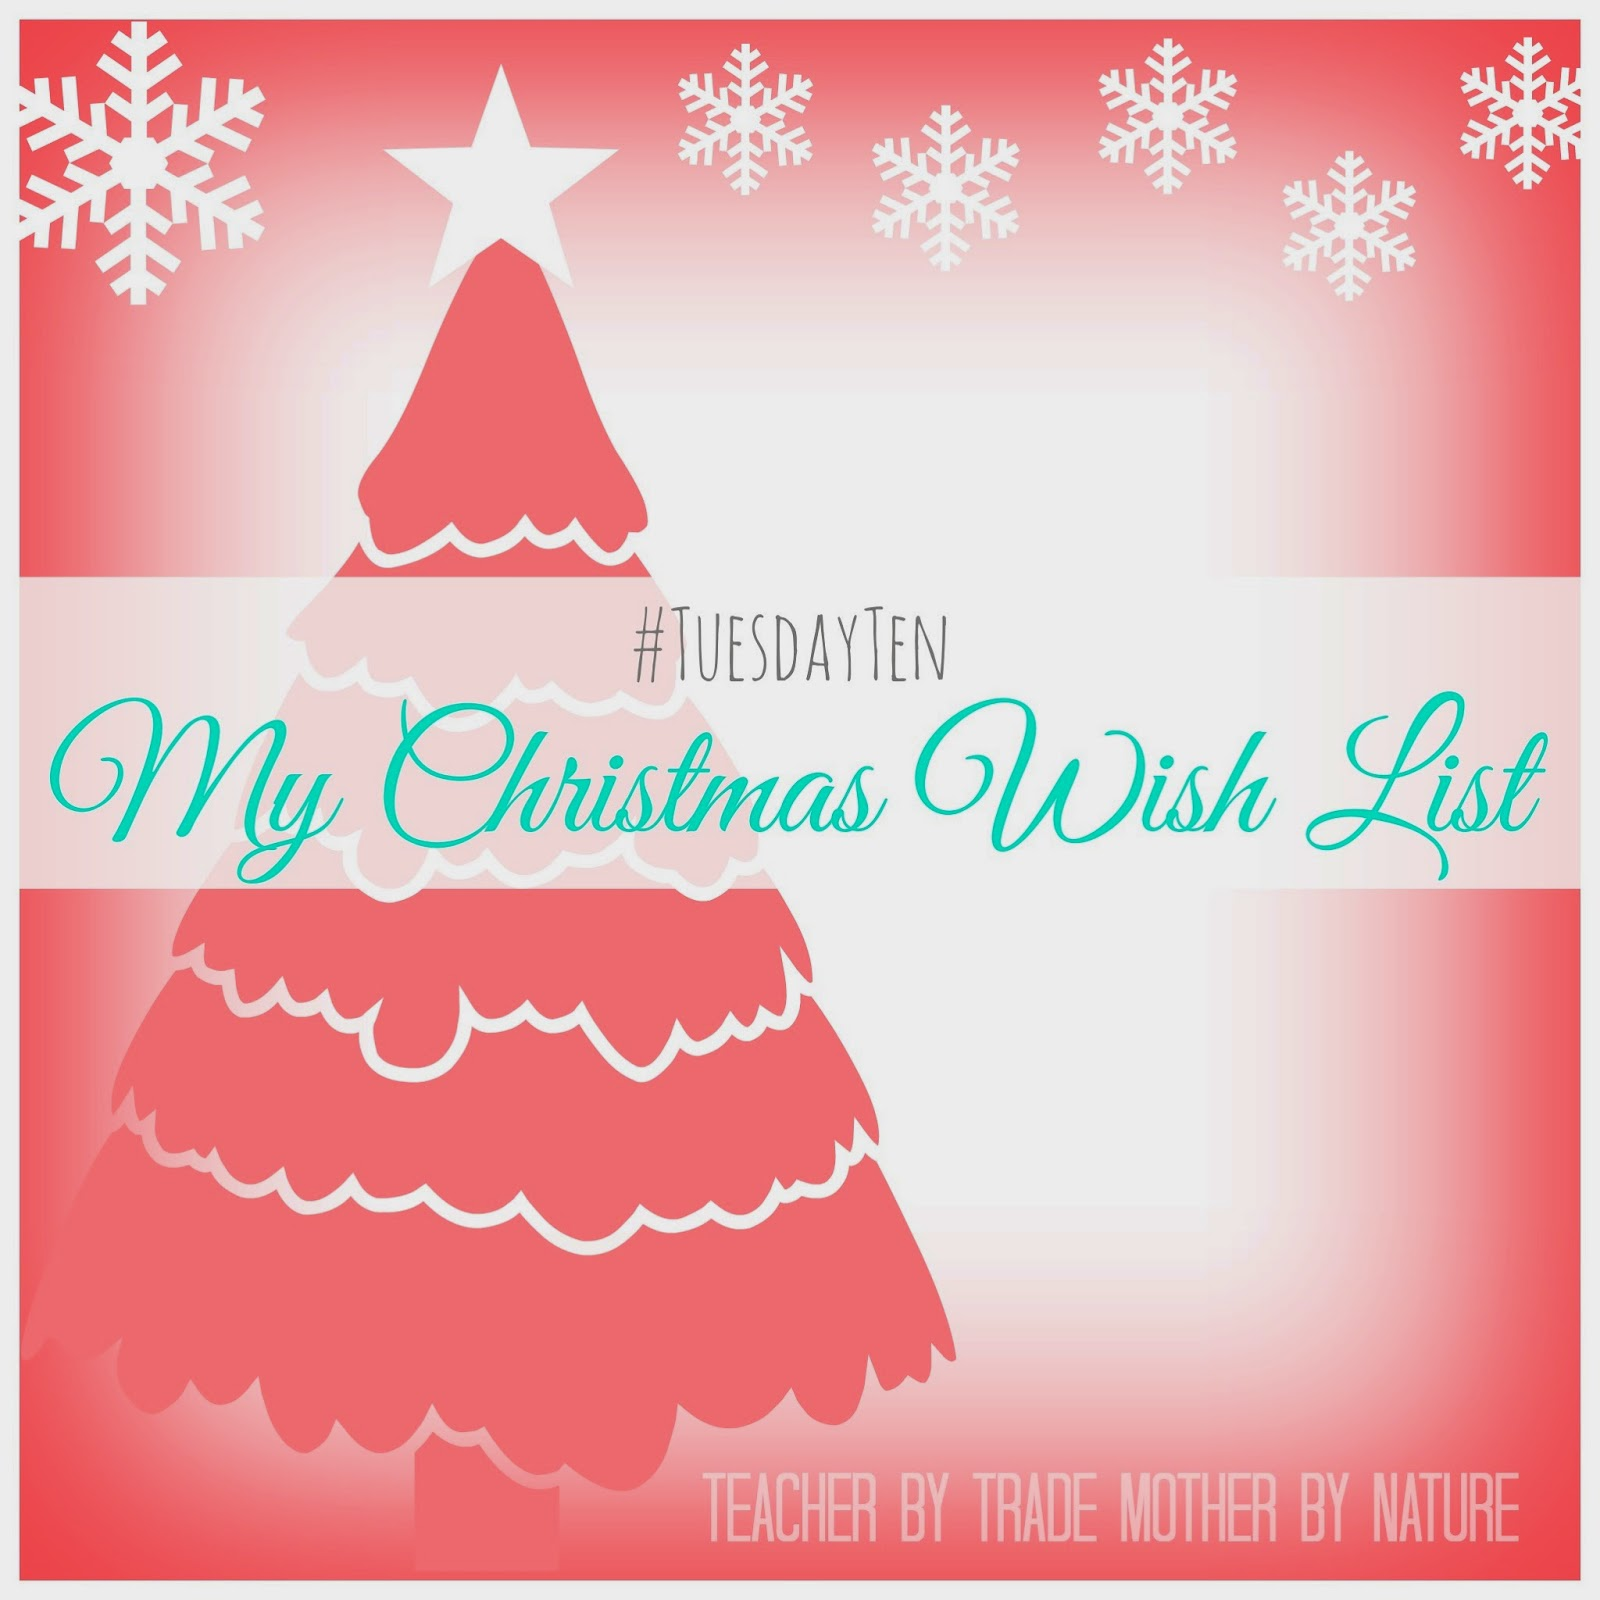 My Christmas Wish List.Tuesdayten My Christmas Wish List Teacher By Trade